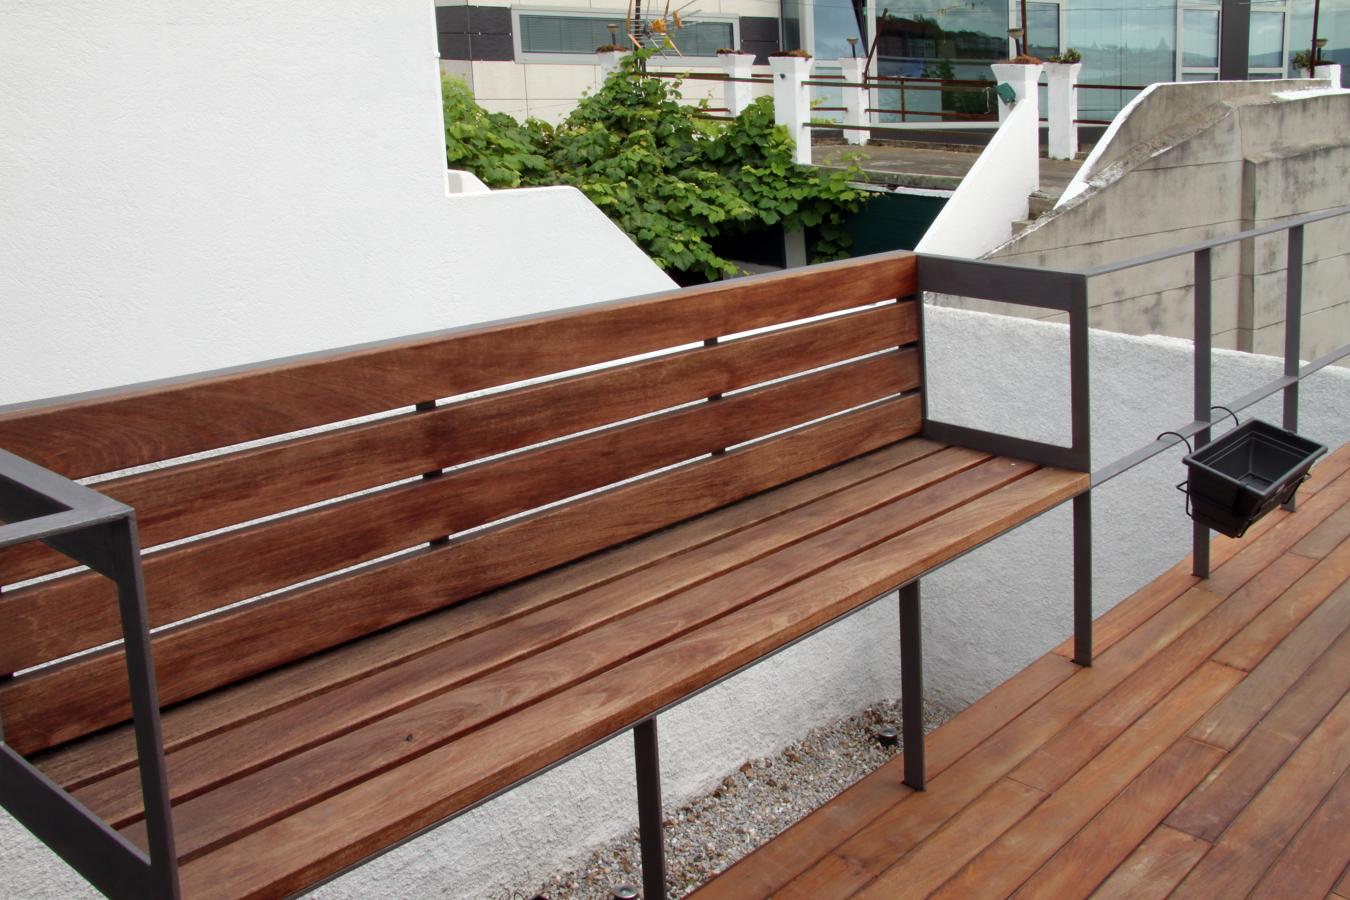 Foto banco barandilla terraza de dedaloarquitectos - Bancos para terraza ...